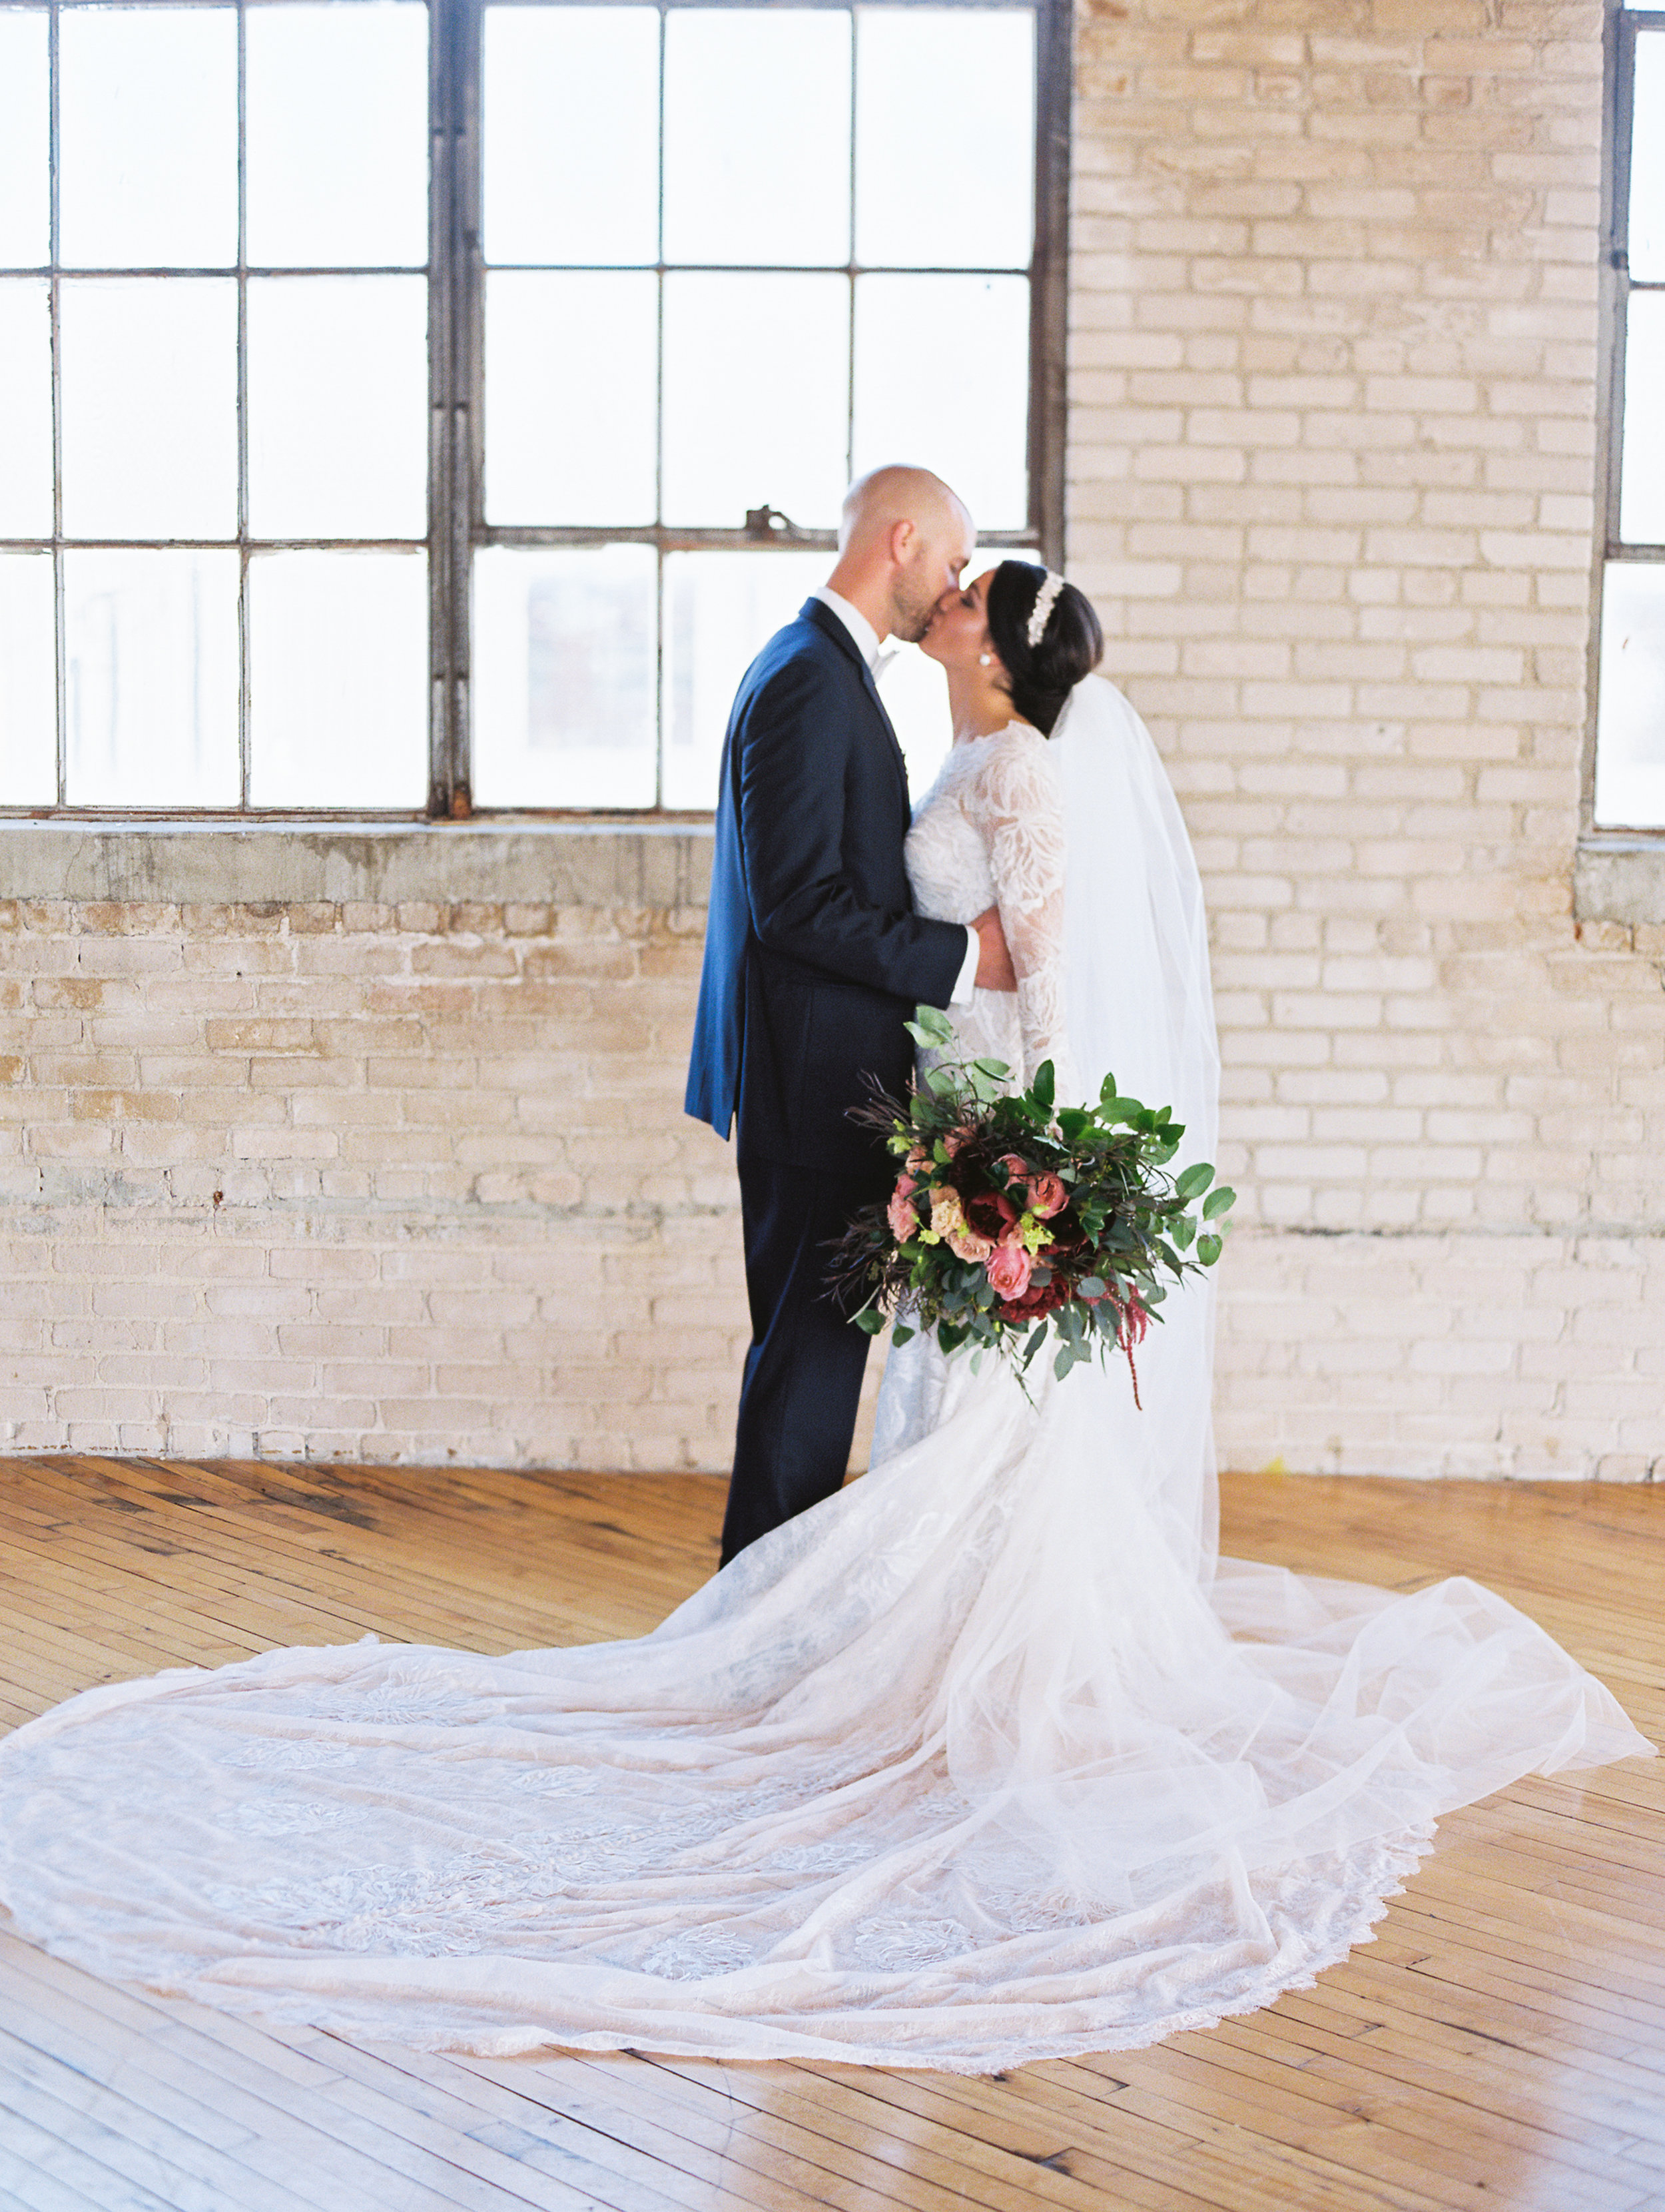 Vogelzang+Wedding+first+look+b-2.jpg